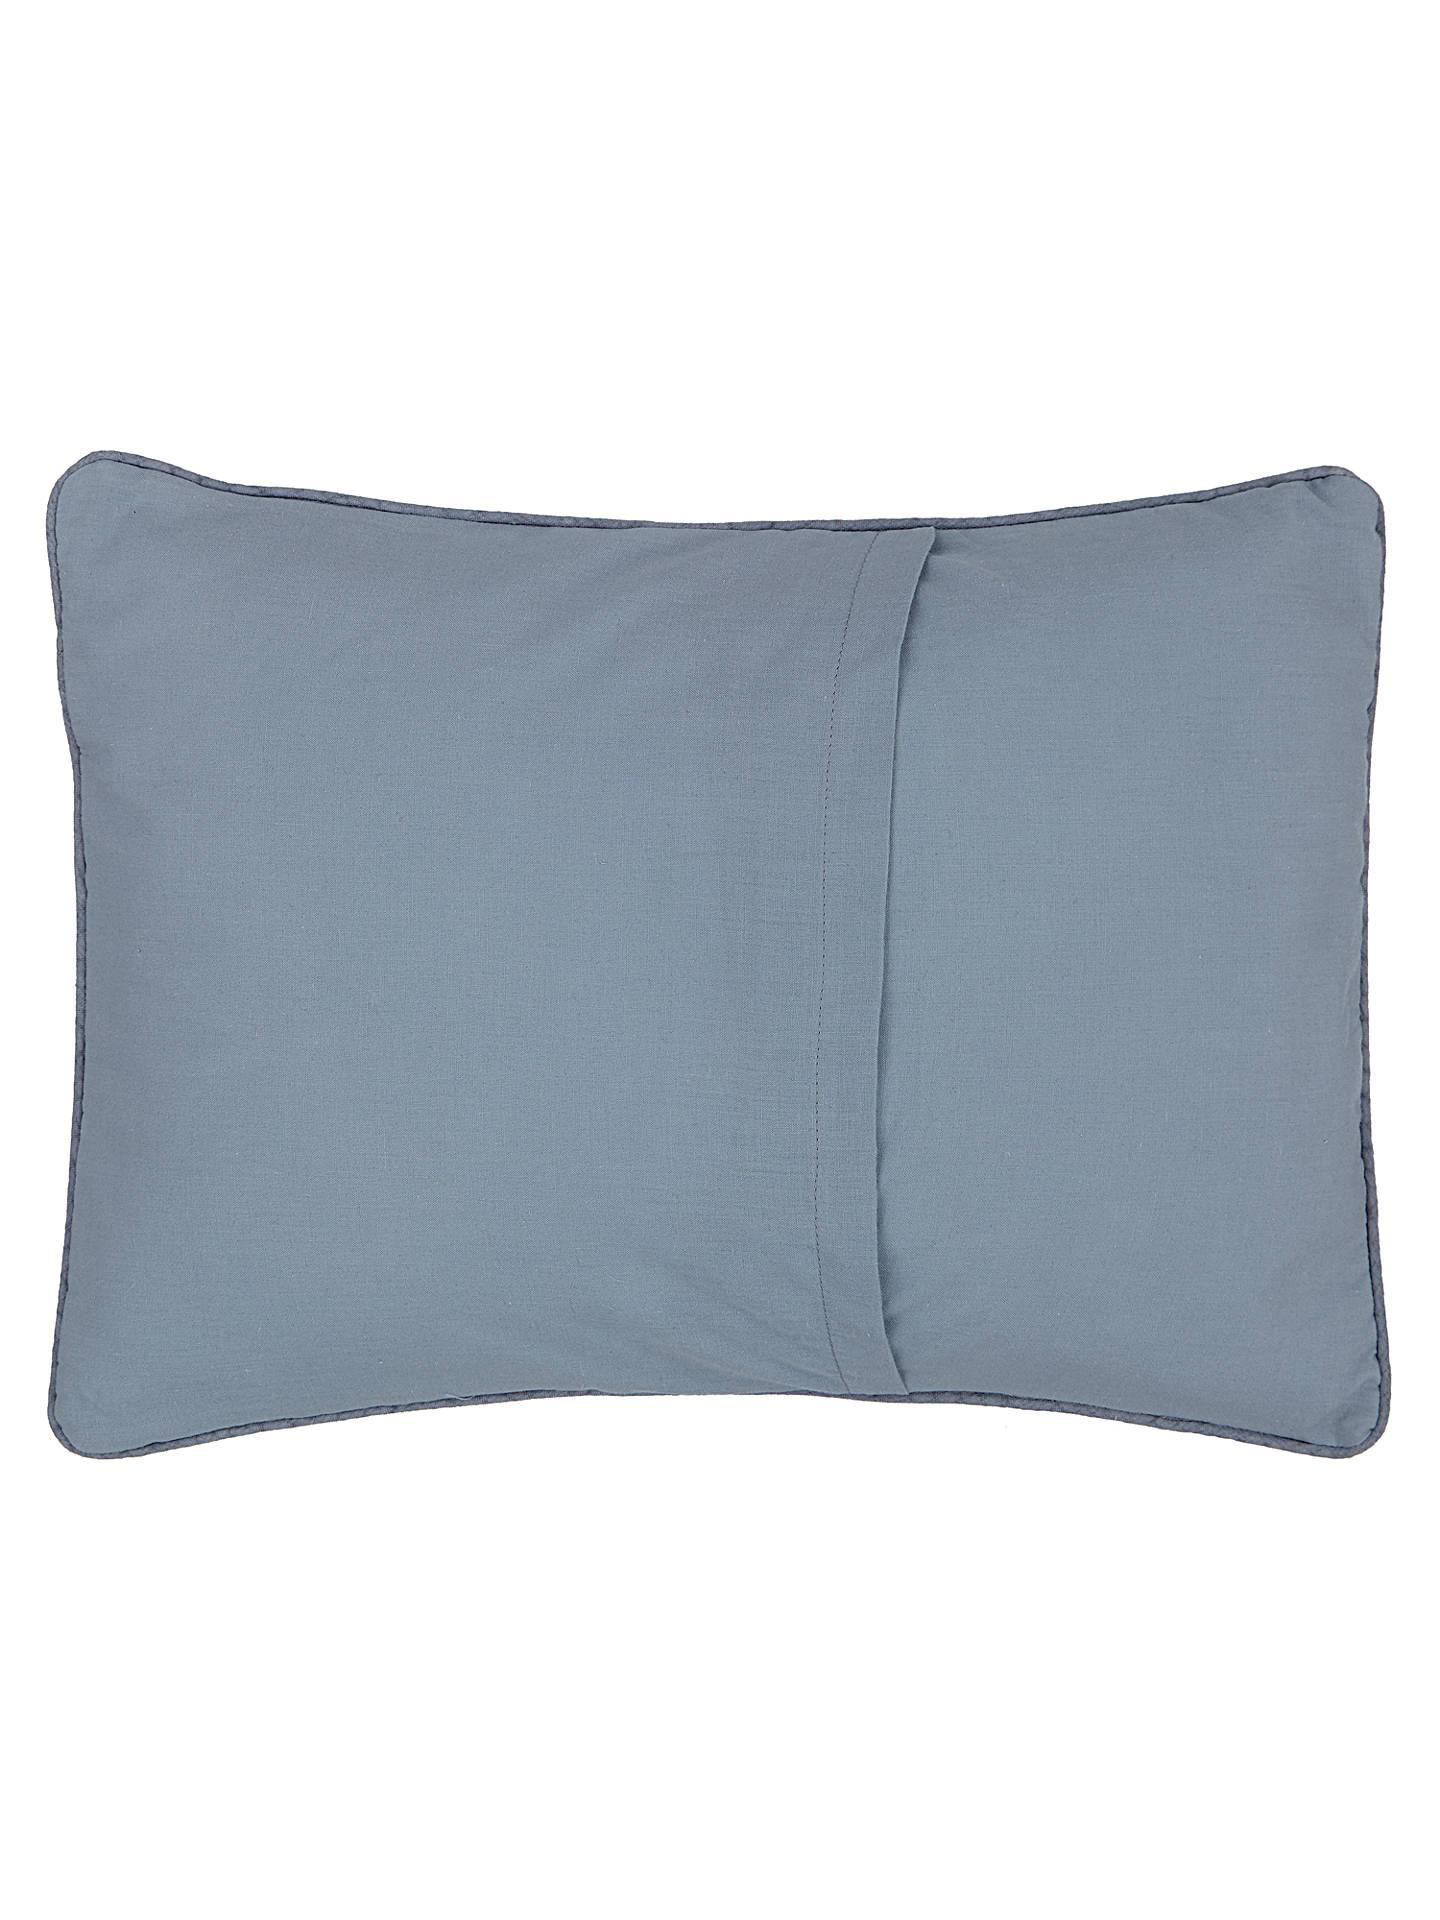 john lewis geometric cushion at john lewis partners. Black Bedroom Furniture Sets. Home Design Ideas